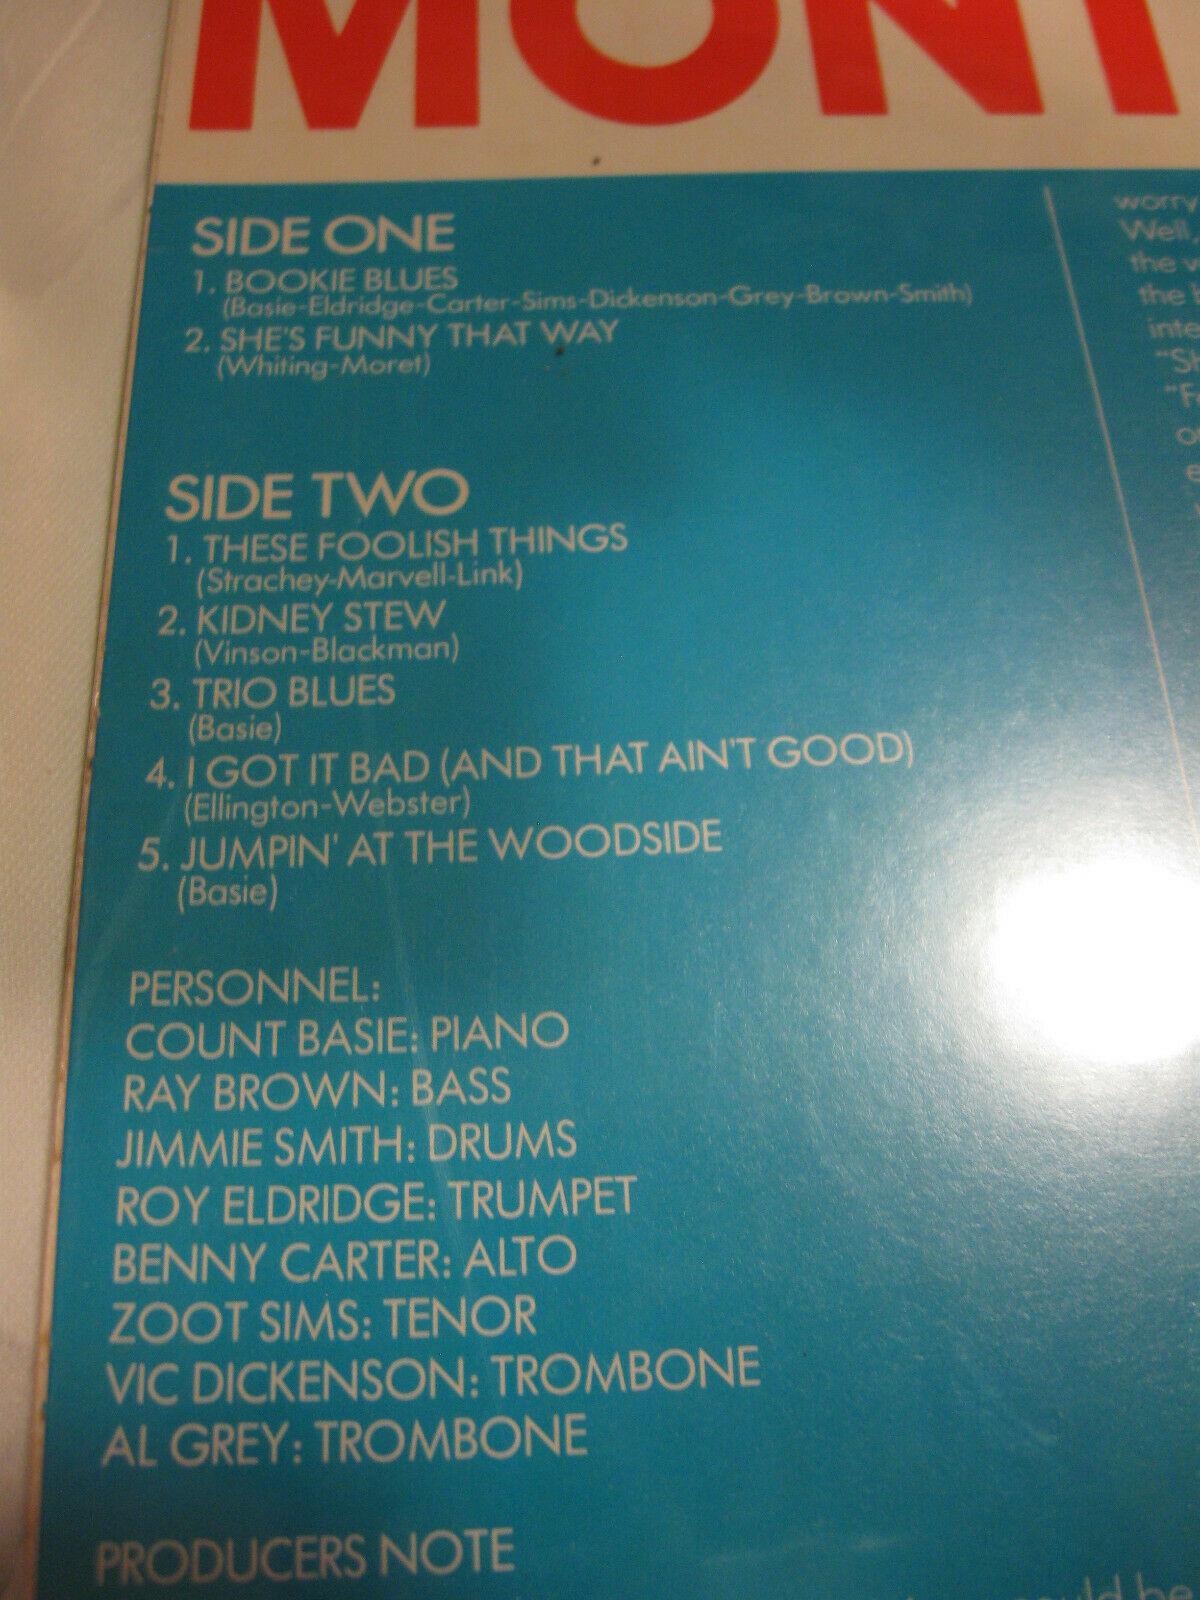 Count Basie Jam Montreux 77 Pablo 2308 239 Stereo Vinyl Record LP Jazz SEALED image 3